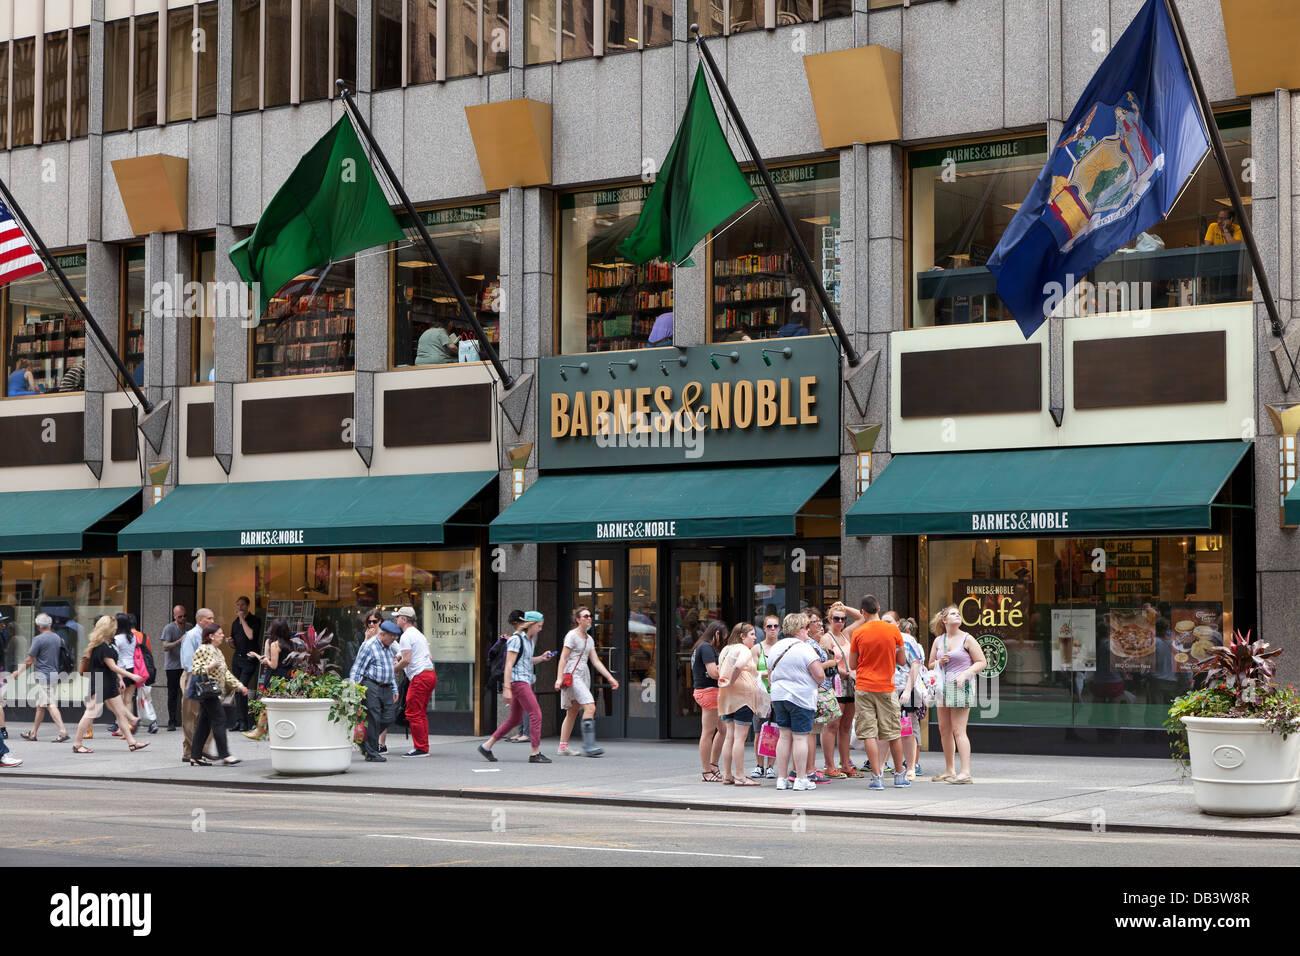 Barnes & Nobles bookstore in New York City - Stock Image